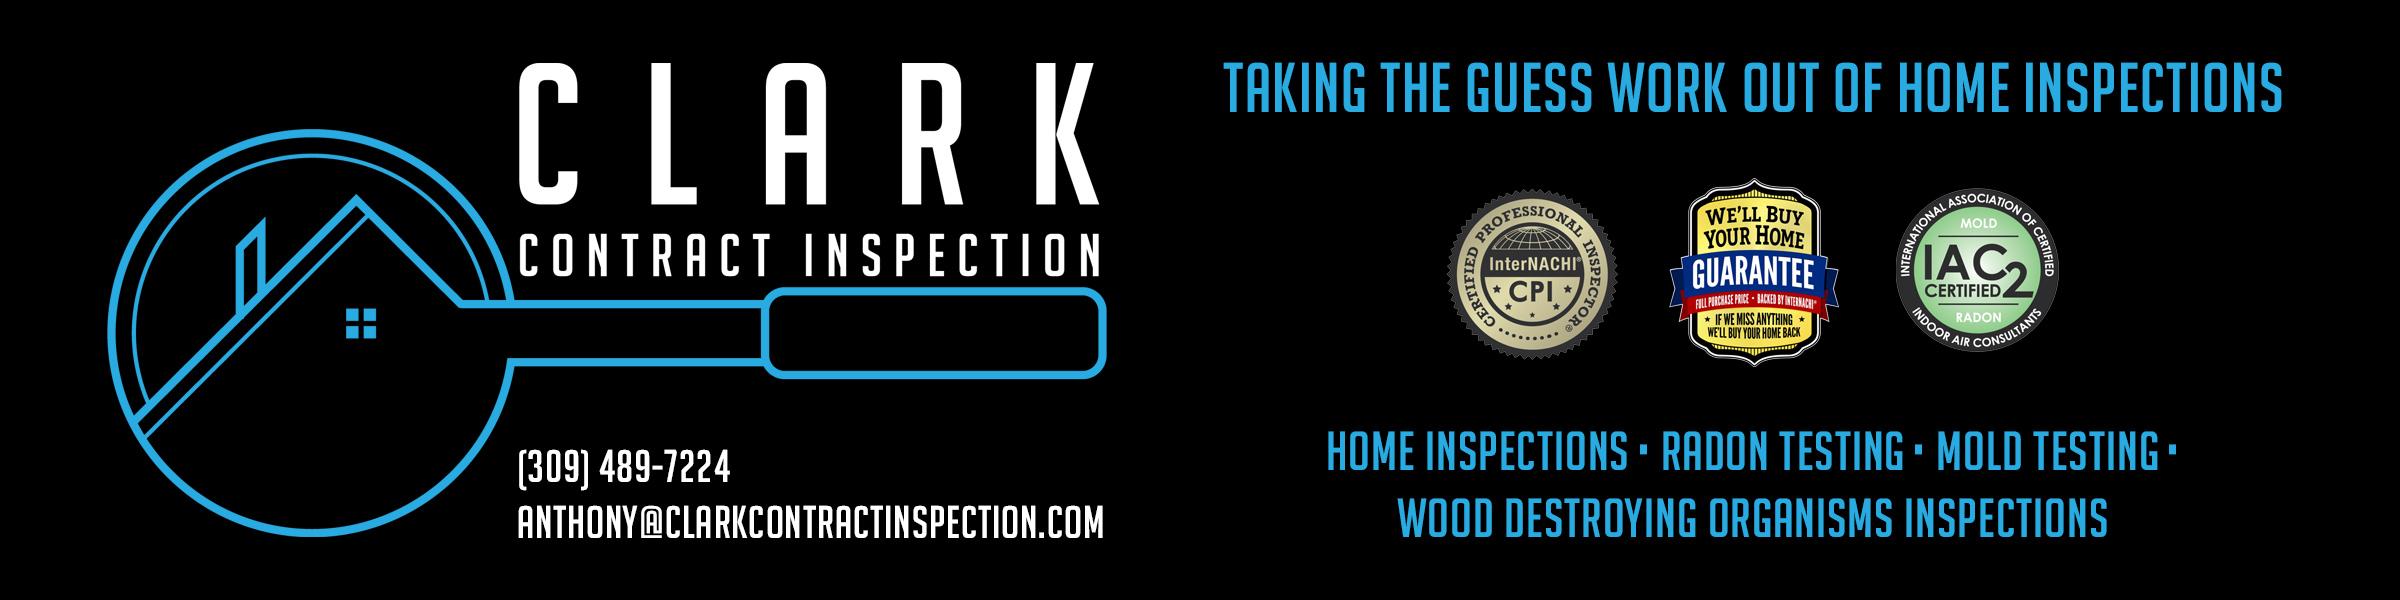 Clark Contract Inspections